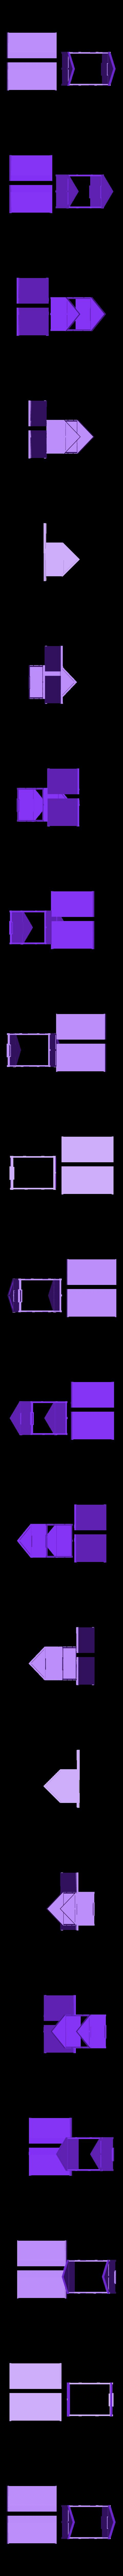 Burh_hut.stl Download free STL file Saxon Burh Hut (on Roman Walls) • 3D printable template, Earsling